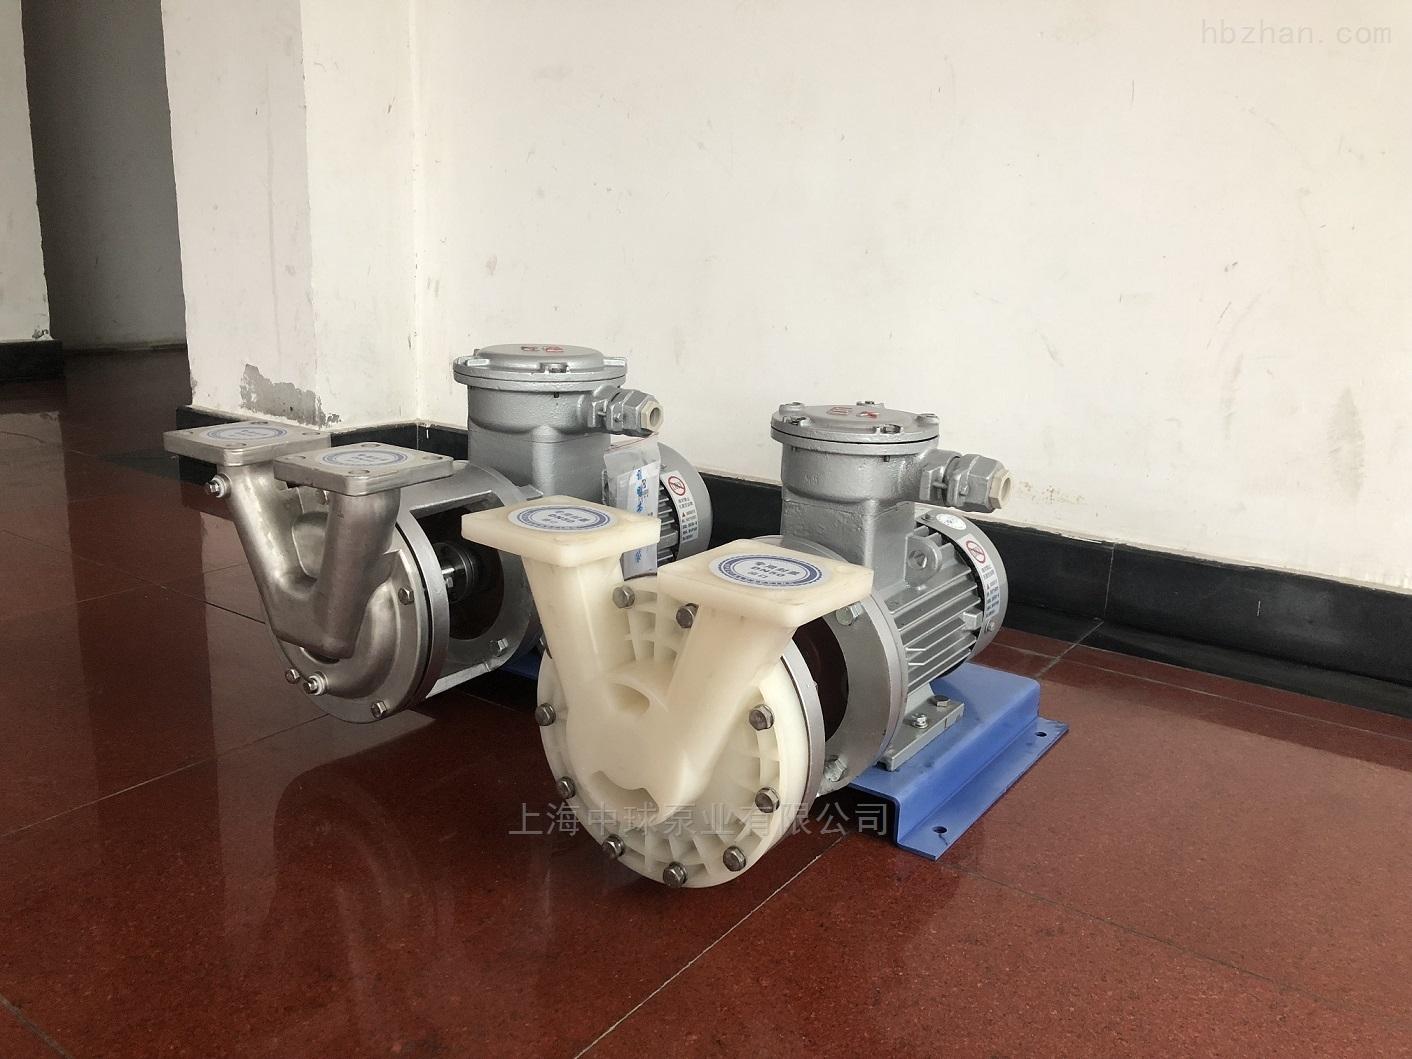 VSP-50B-PLUS固体粉末投料泵